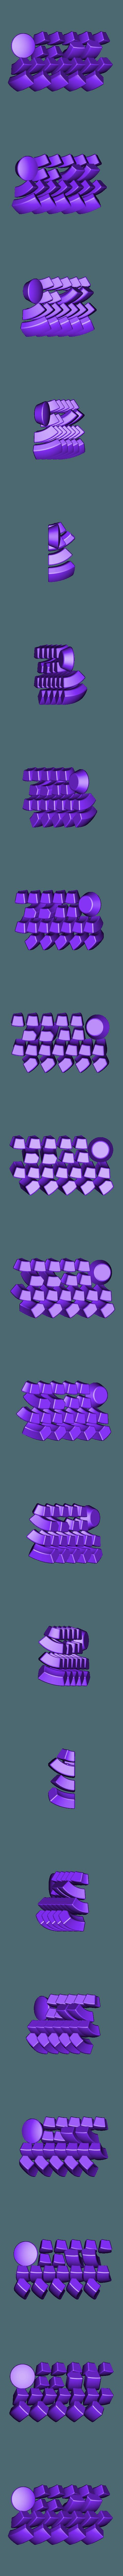 Sphere Builder Blocks B.stl Download free STL file Sphere Builder • 3D printable object, FerryTeacher